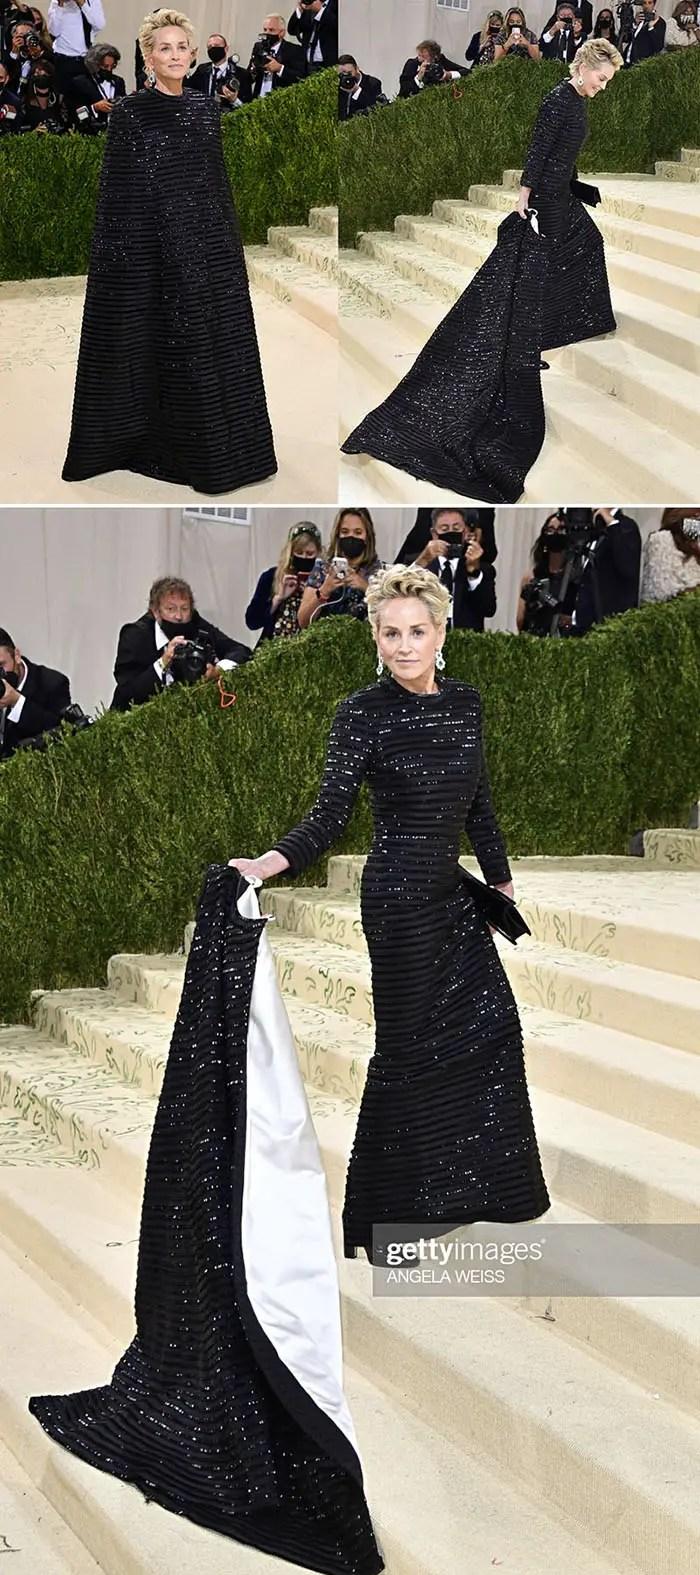 Sharon Stone at the Met Gala